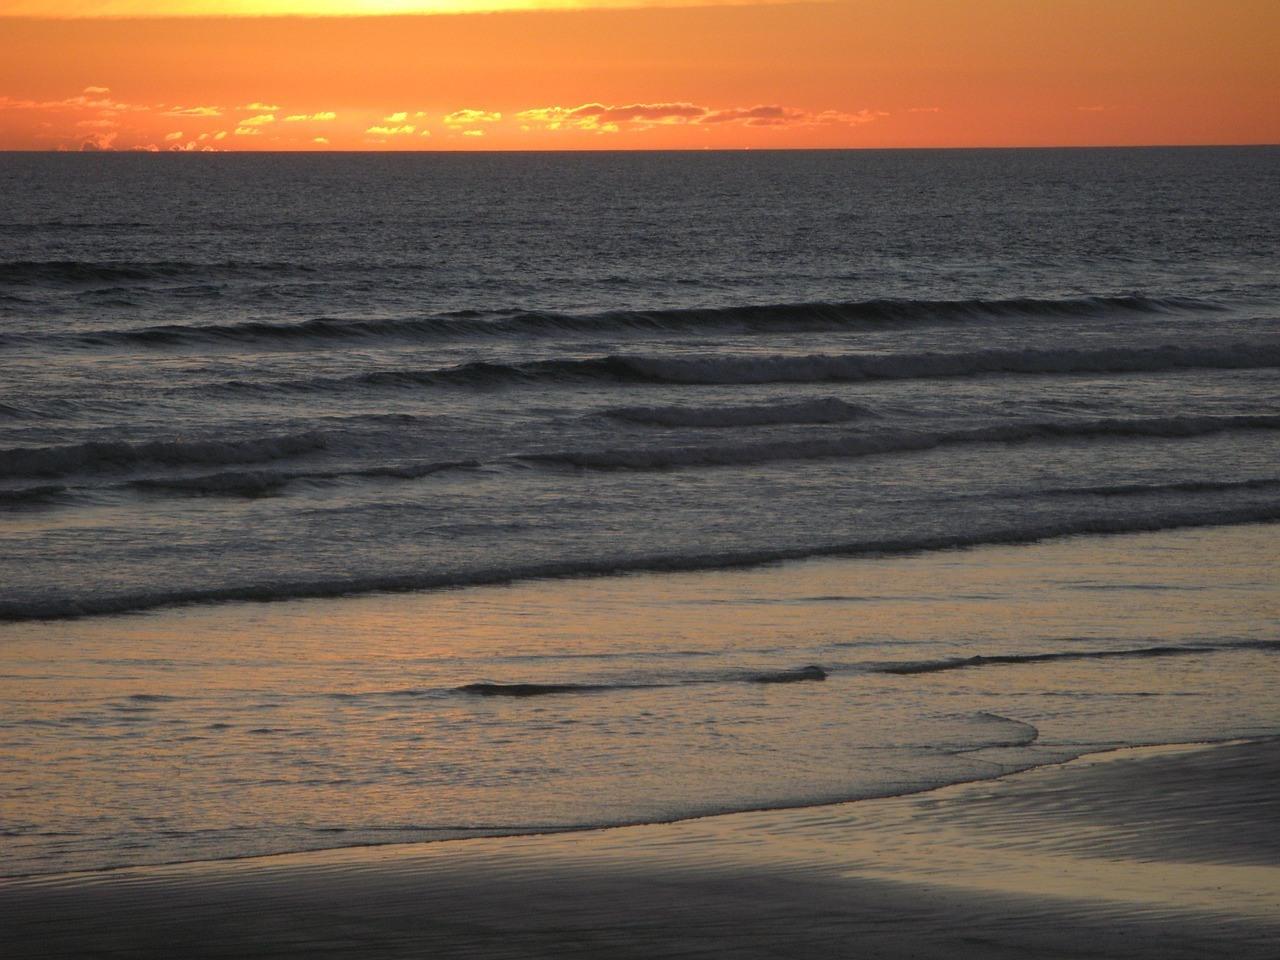 Sunset at Ninety Mile Beach - North Island New Zealand